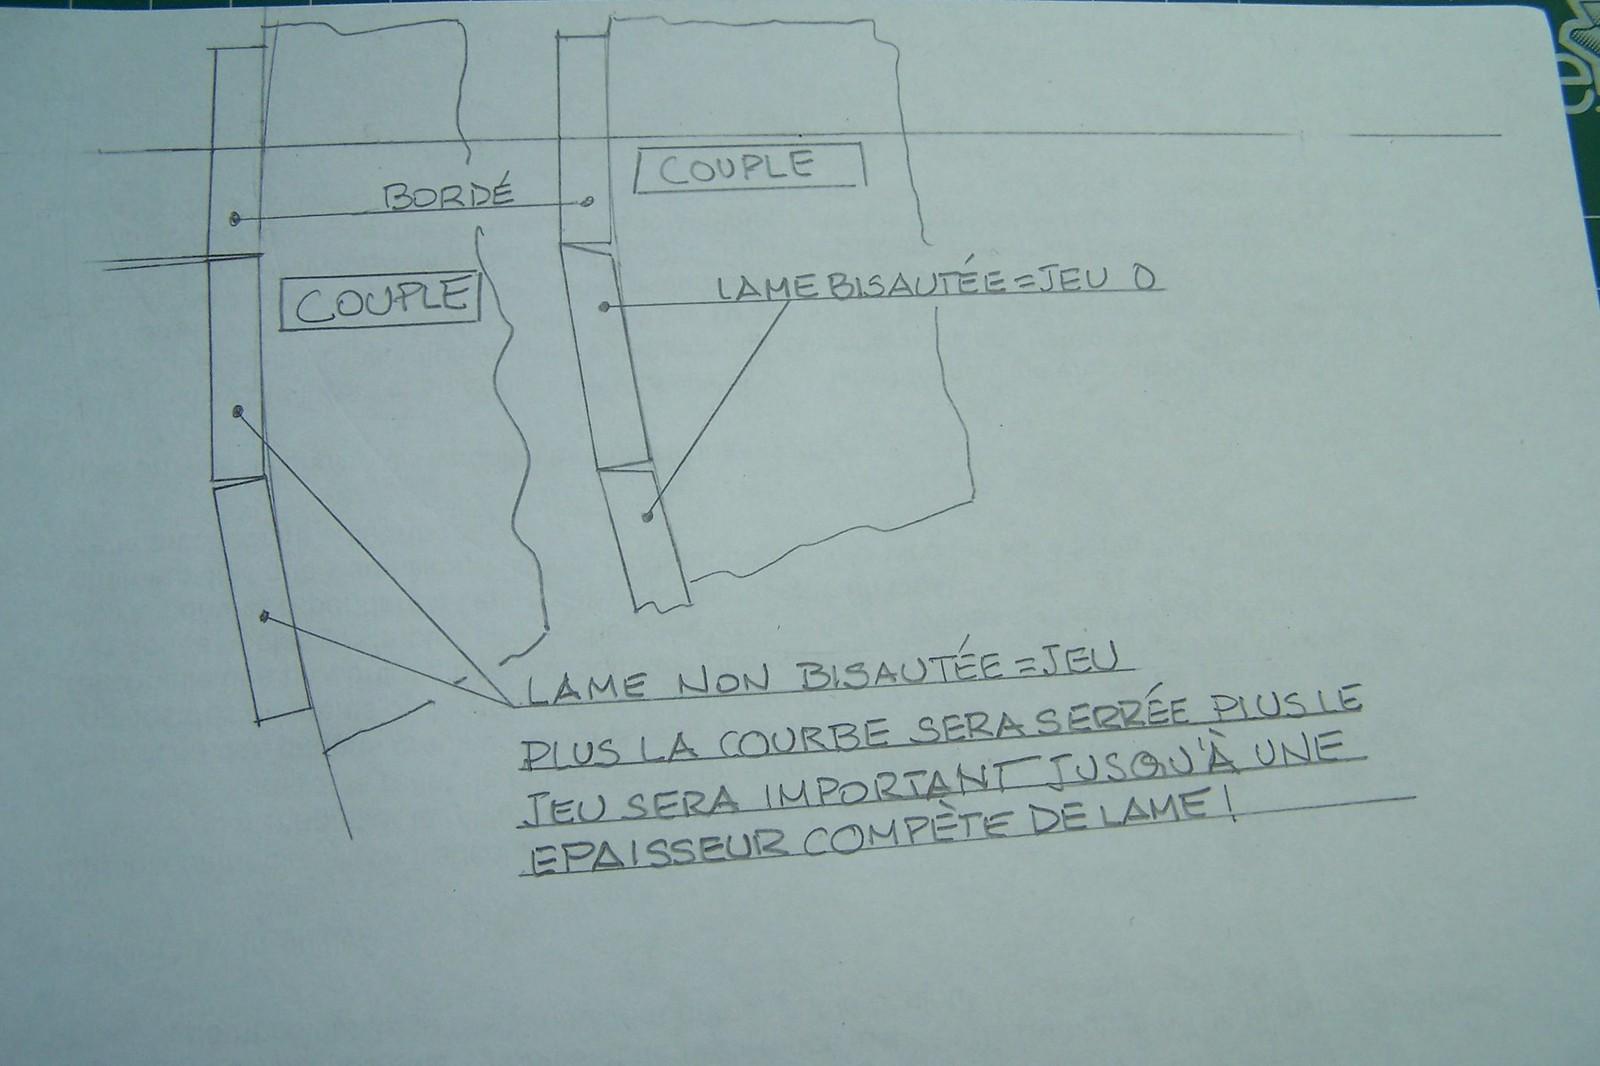 U-96 Hachette/Amati - Page 2 29726052992_09a7cd1f53_h